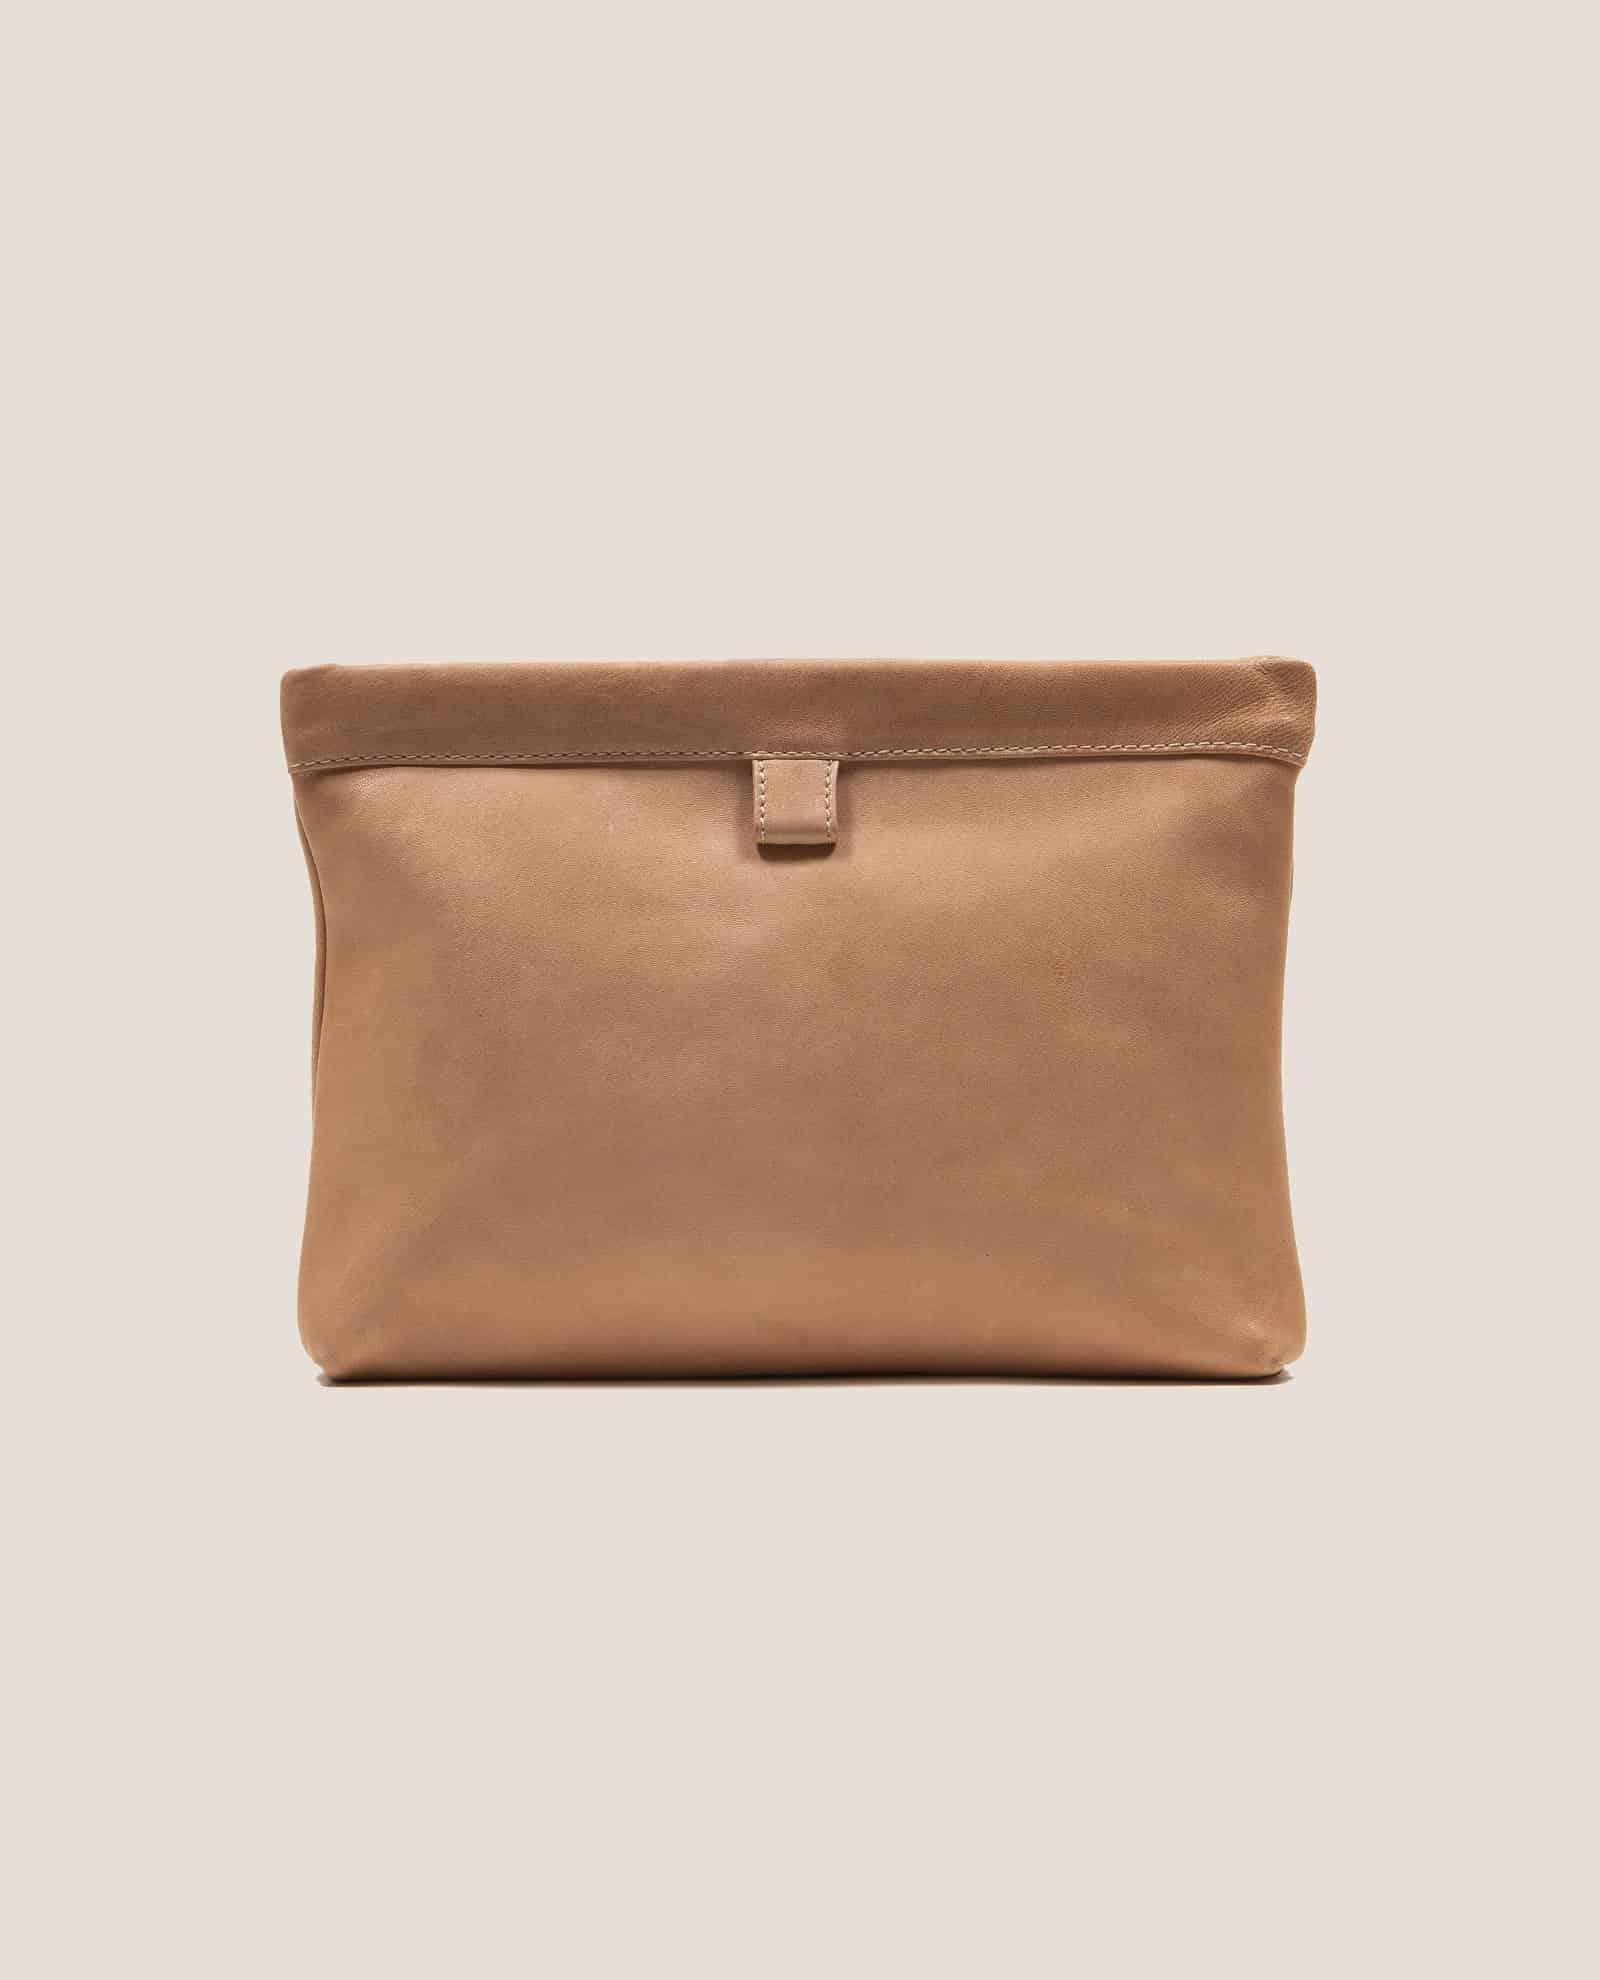 Clutch, handbag, Marlen Pink (ref #MPR-29) Petty Things